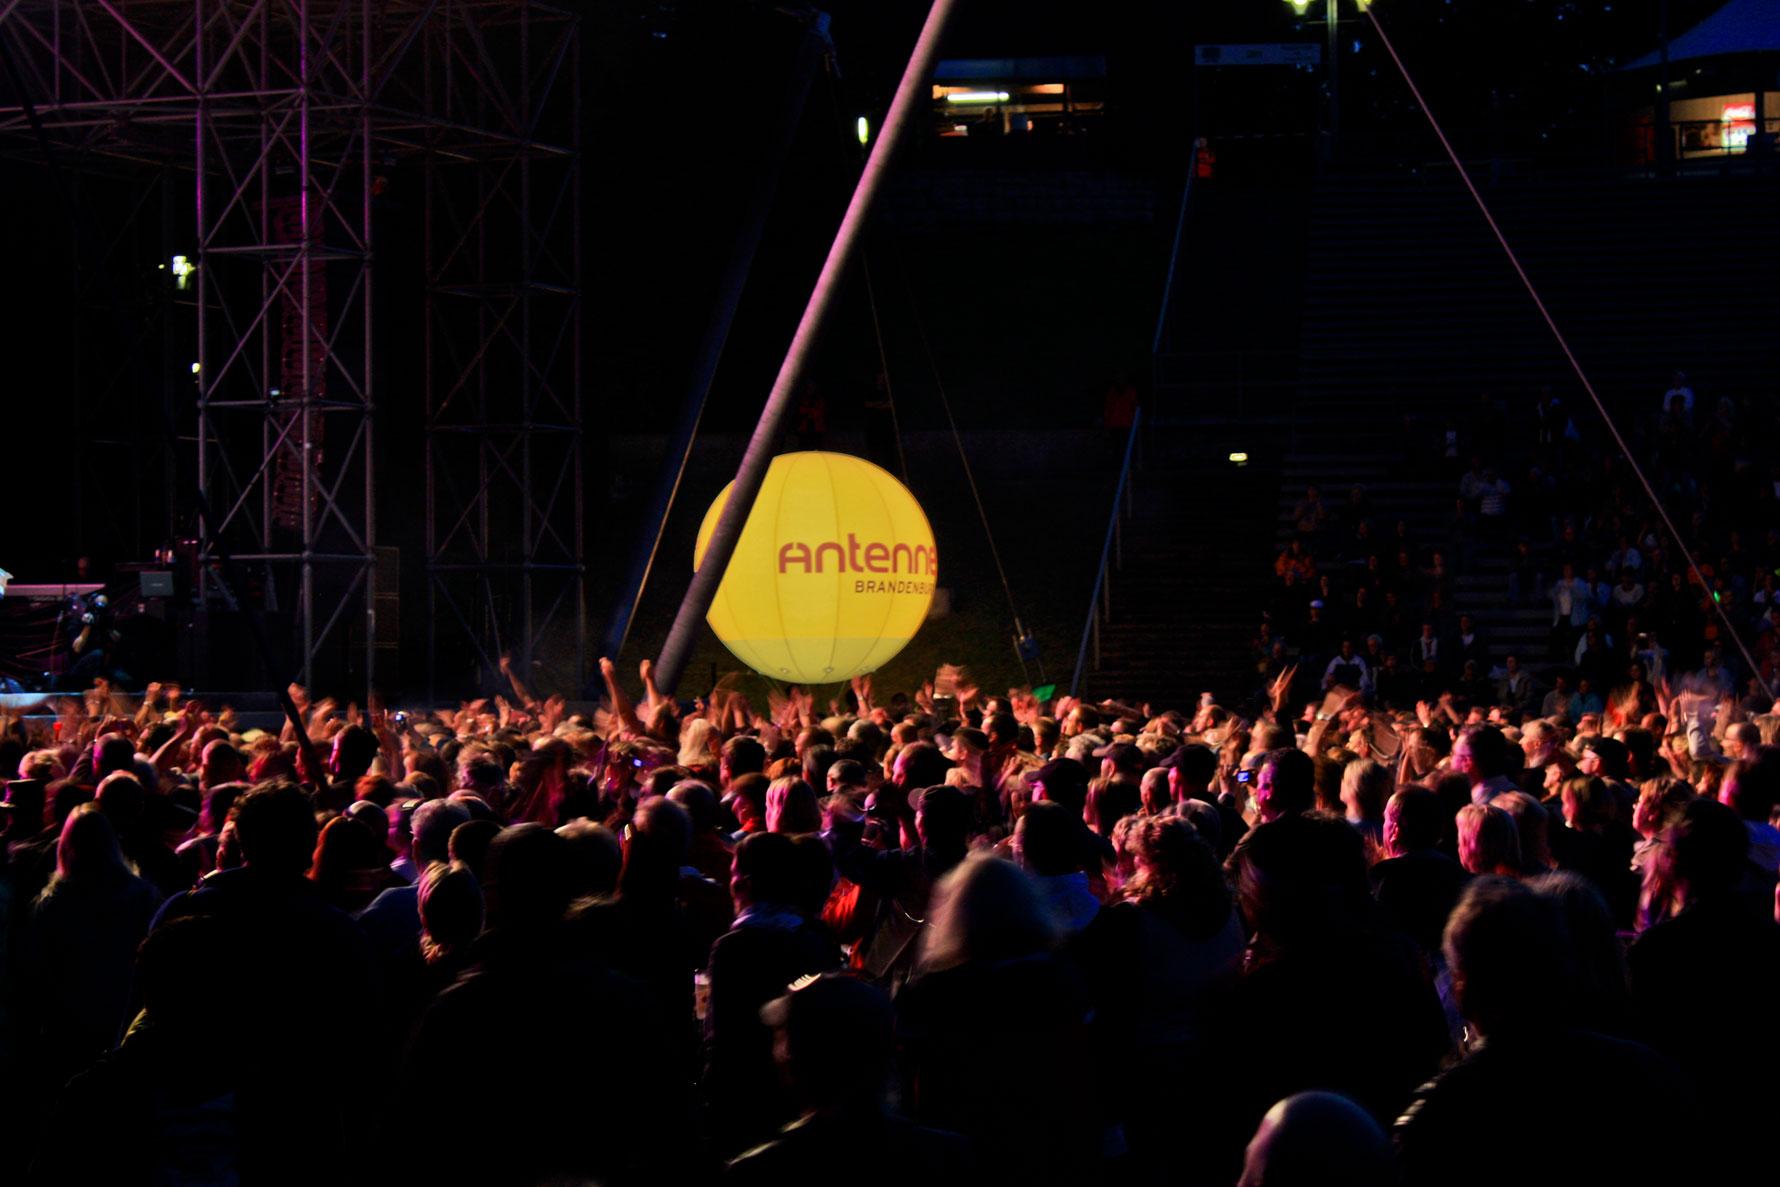 Lichtballon,-Bühne